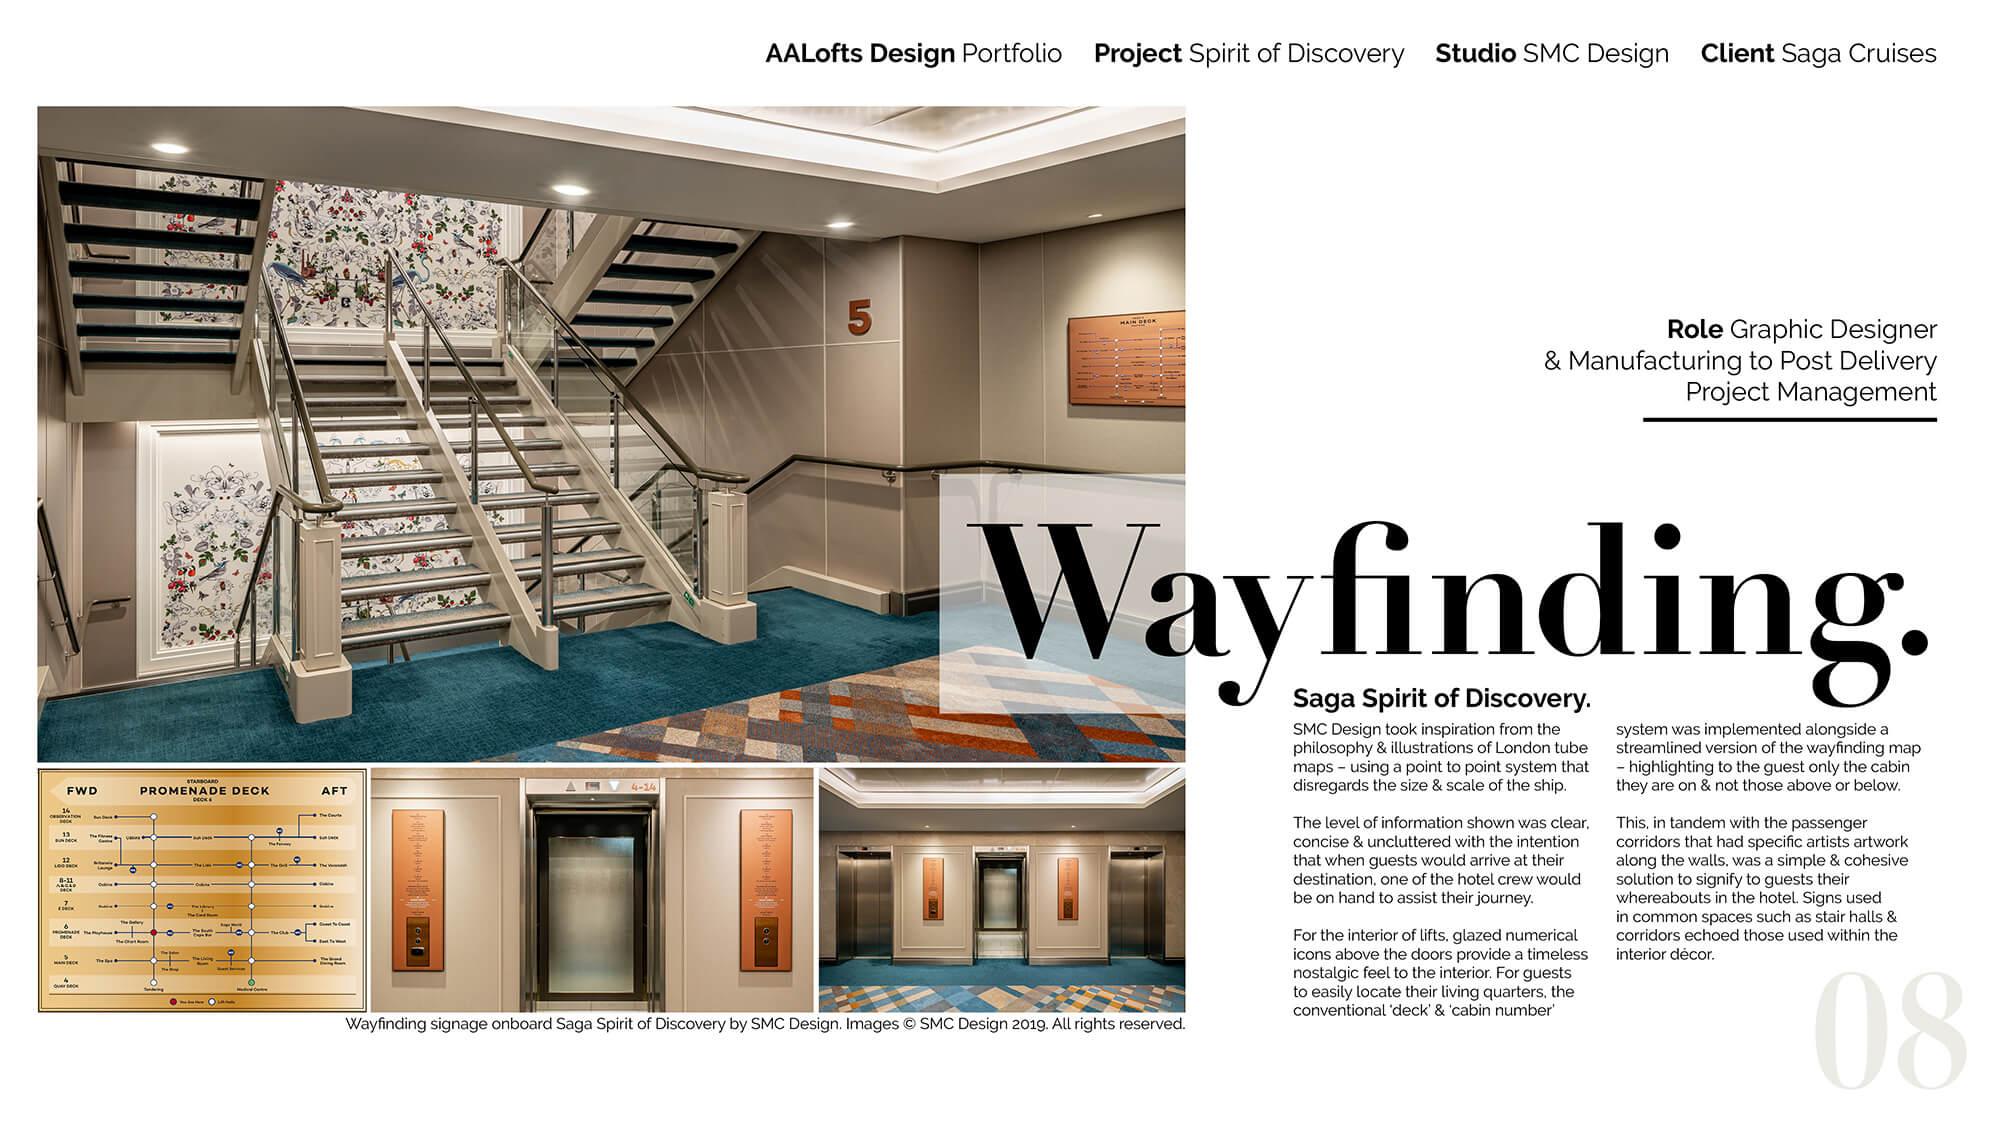 2021_AALOFTS DESIGN PORTFOLIO_Page_08